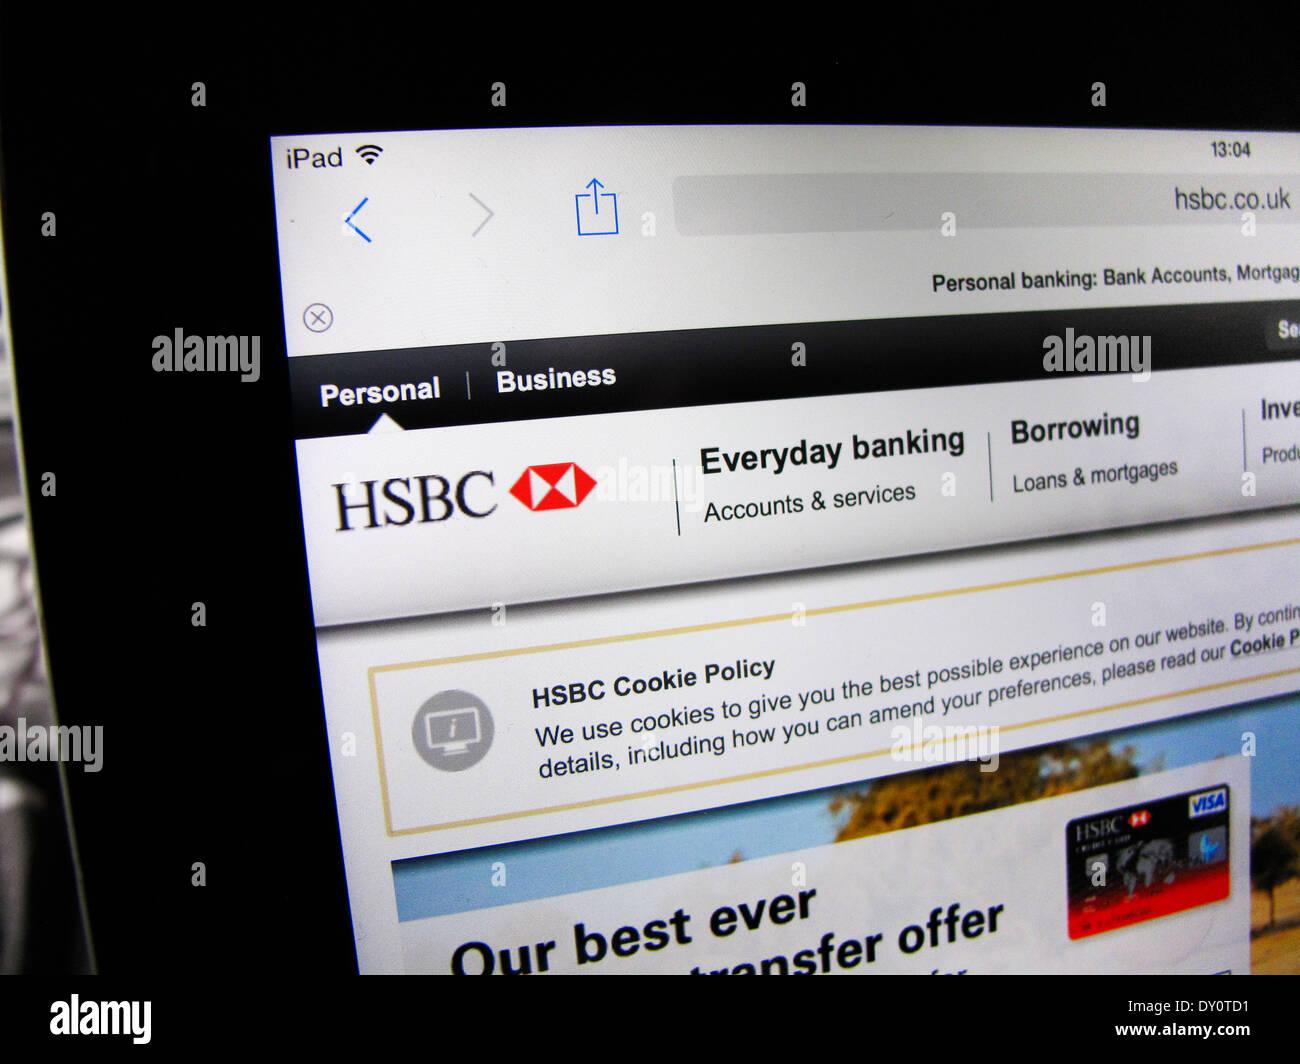 HSBC website on iPad Stock Photo: 68245997 - Alamy